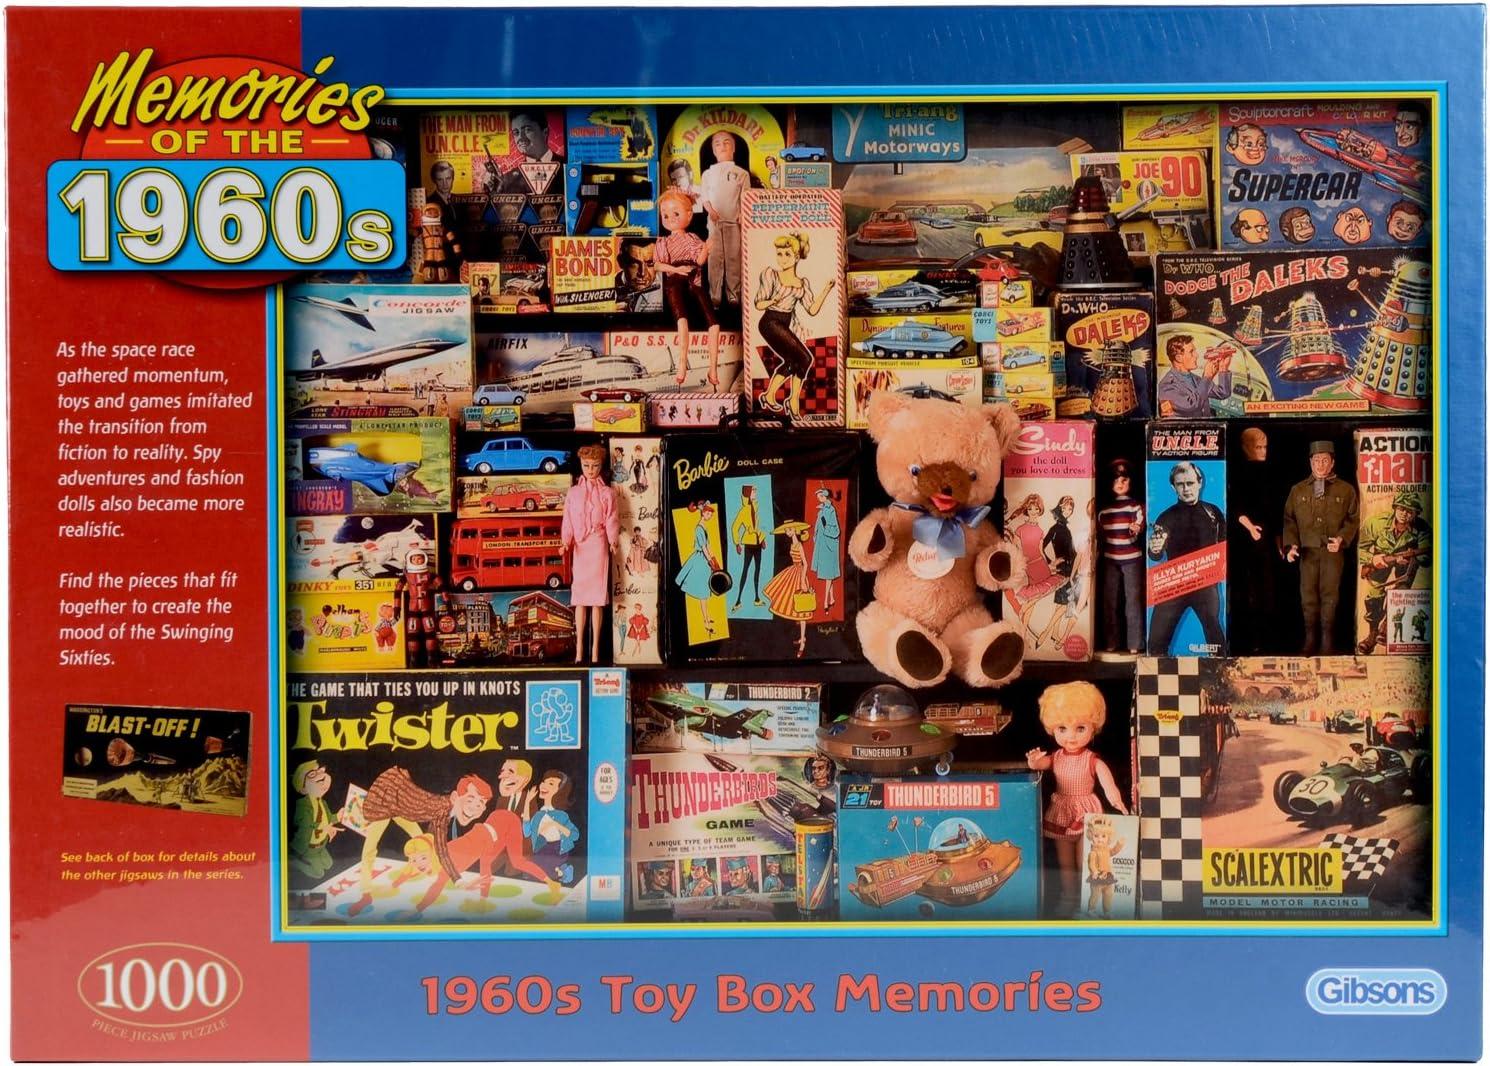 B003BBHJ8G Gibson 1960's Toy Box Memories 1000 Piece Puzzle 817iyIXVmzL.SL1500_